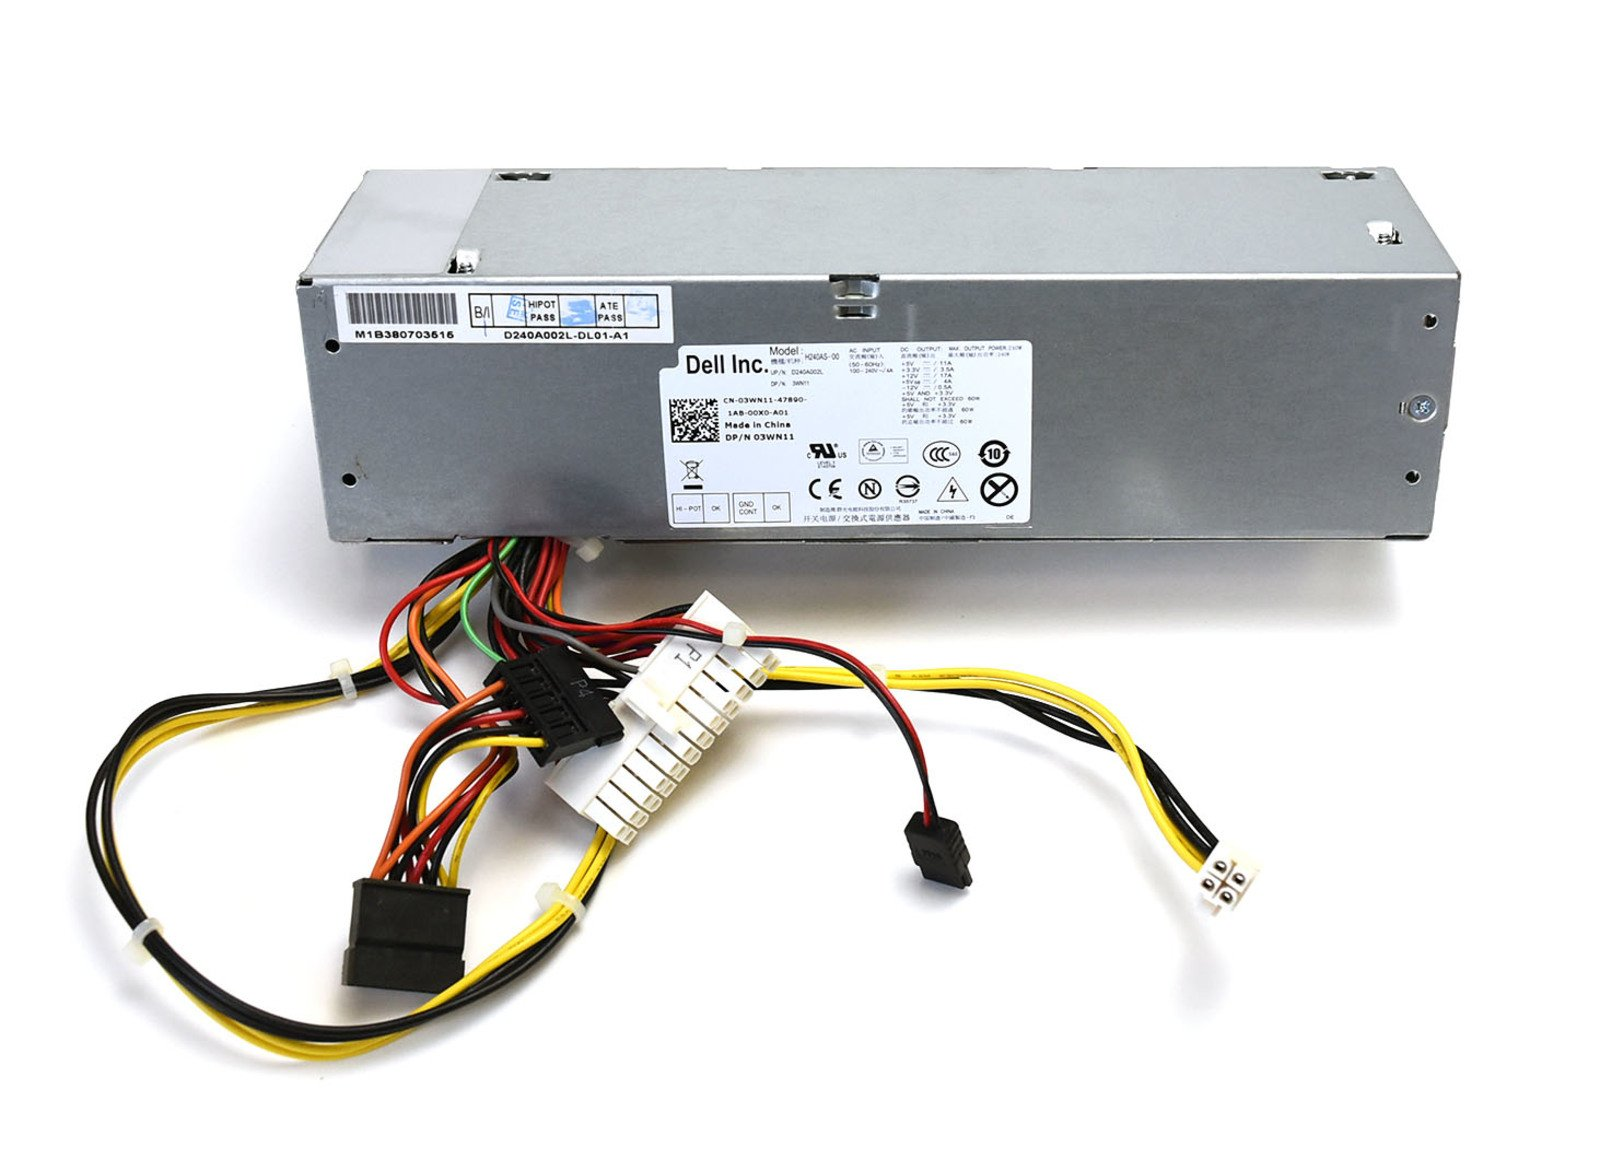 Original Equipment Manufacturer 2TXYM 240W Dell Optiplex SFF L240AS-00 PS-5241-5DF 240 Watt Power Source P/S 100-240V PSU Authentic Genuine OEM Power Supply Unit